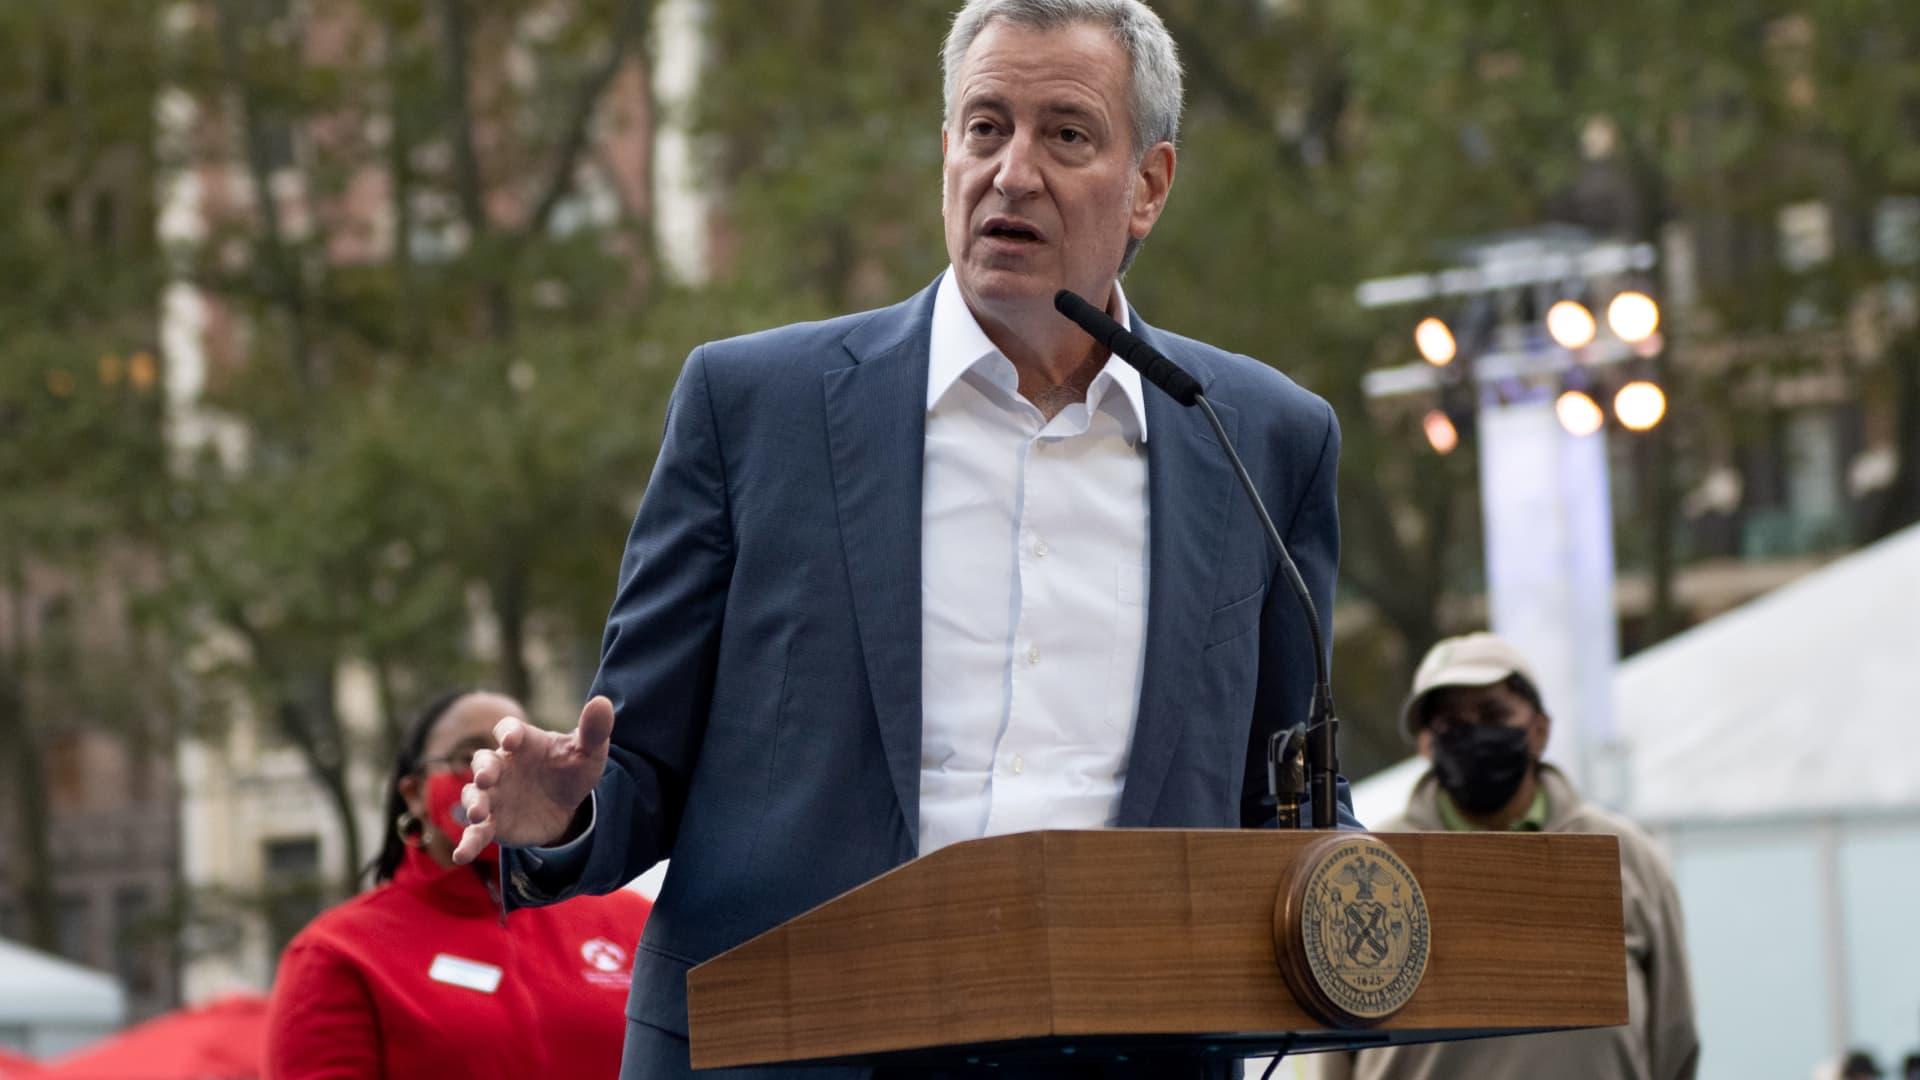 New York City Mayor Bill de Blasio speaks at Bryant Park on Nov. 5, 2020.